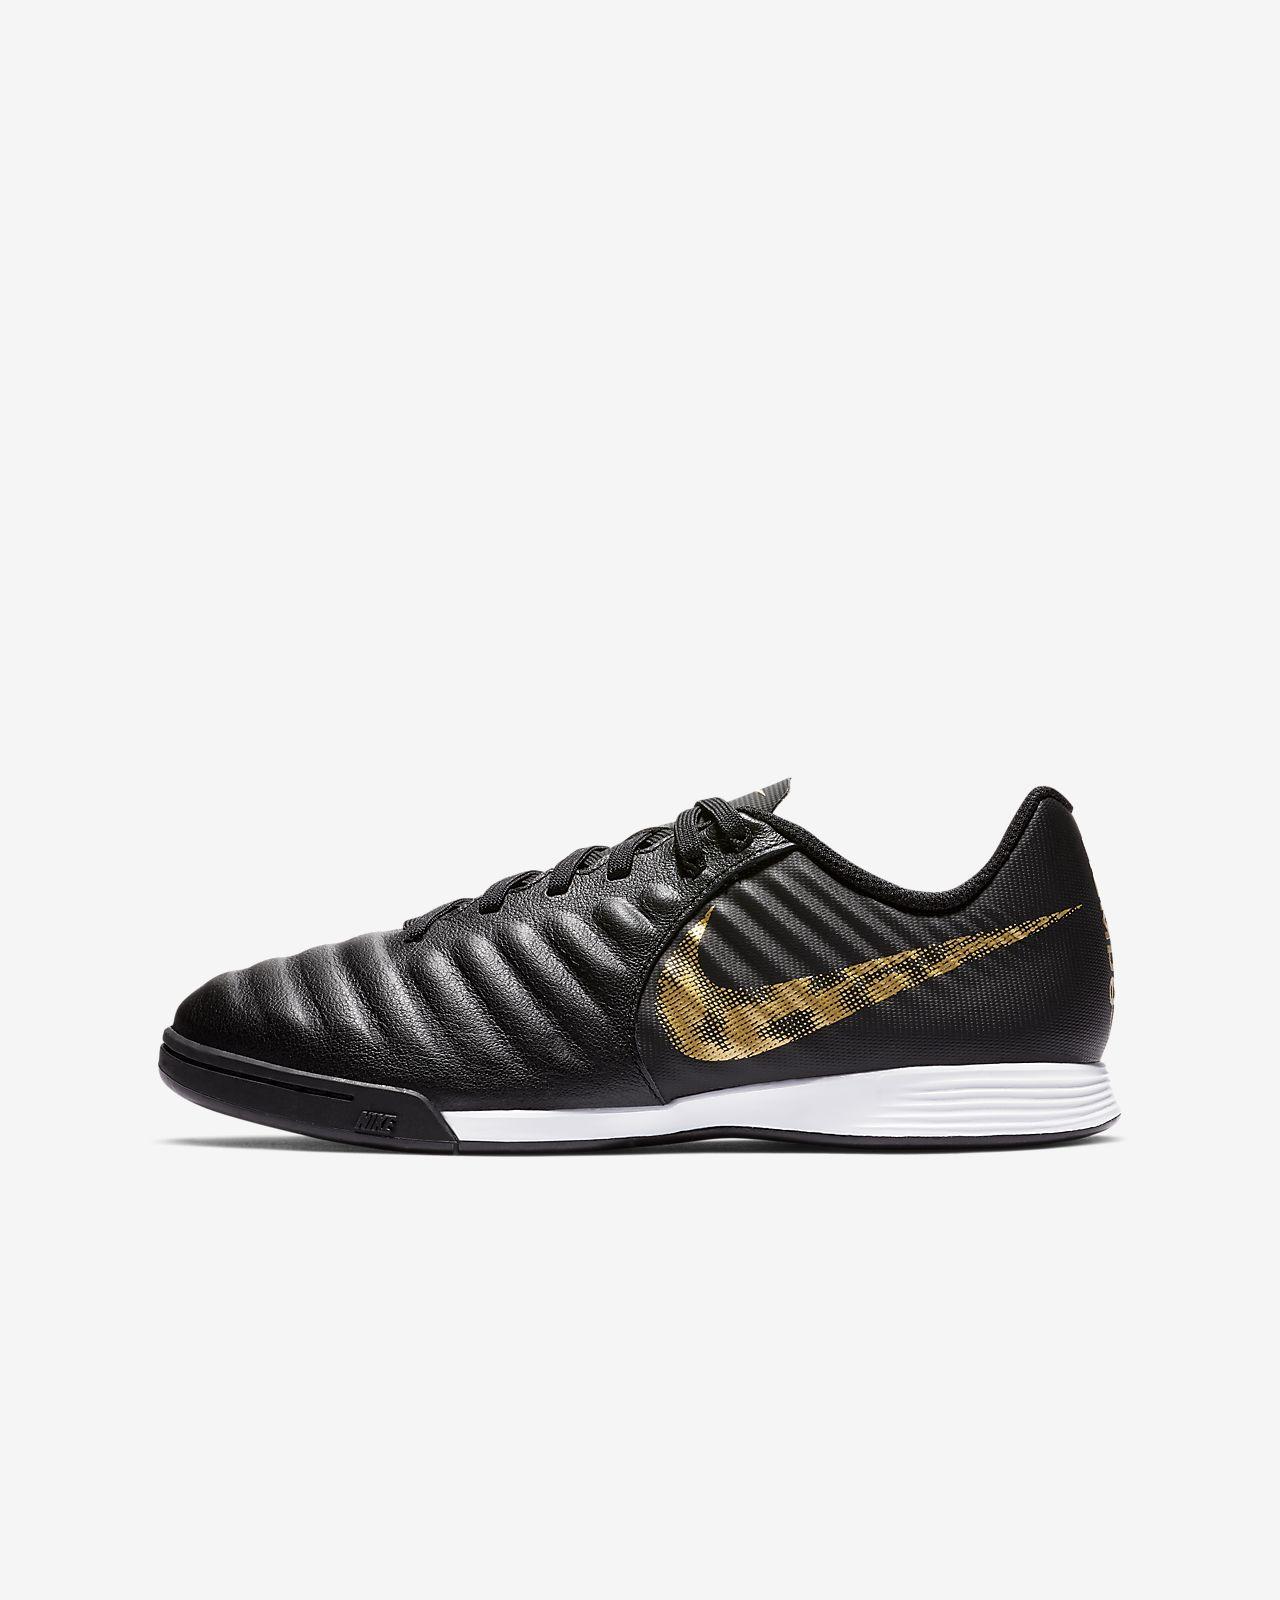 best sneakers 2eff3 1ef10 Sala Ic Nike Vii Legendx De Tiempo Nen Futbol Botes Academy Jr aqAqXpxzw